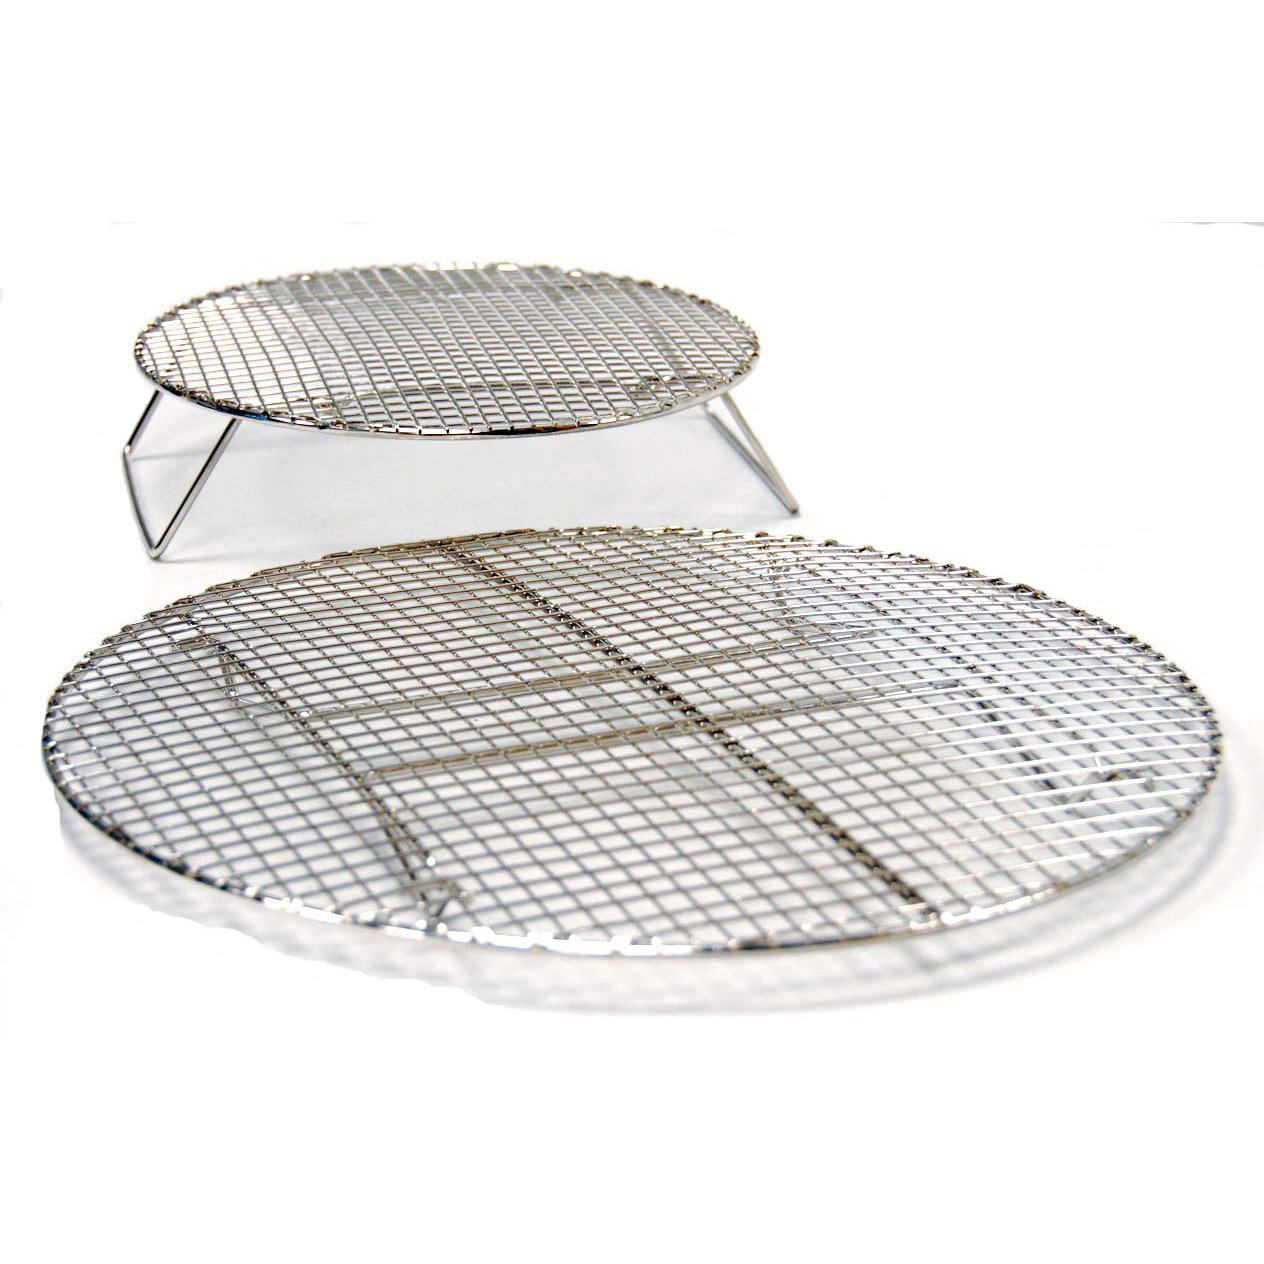 evo-outdoor-grills-2-piece-all-grills-circular-roasting-and-baking-rack-set.jpg